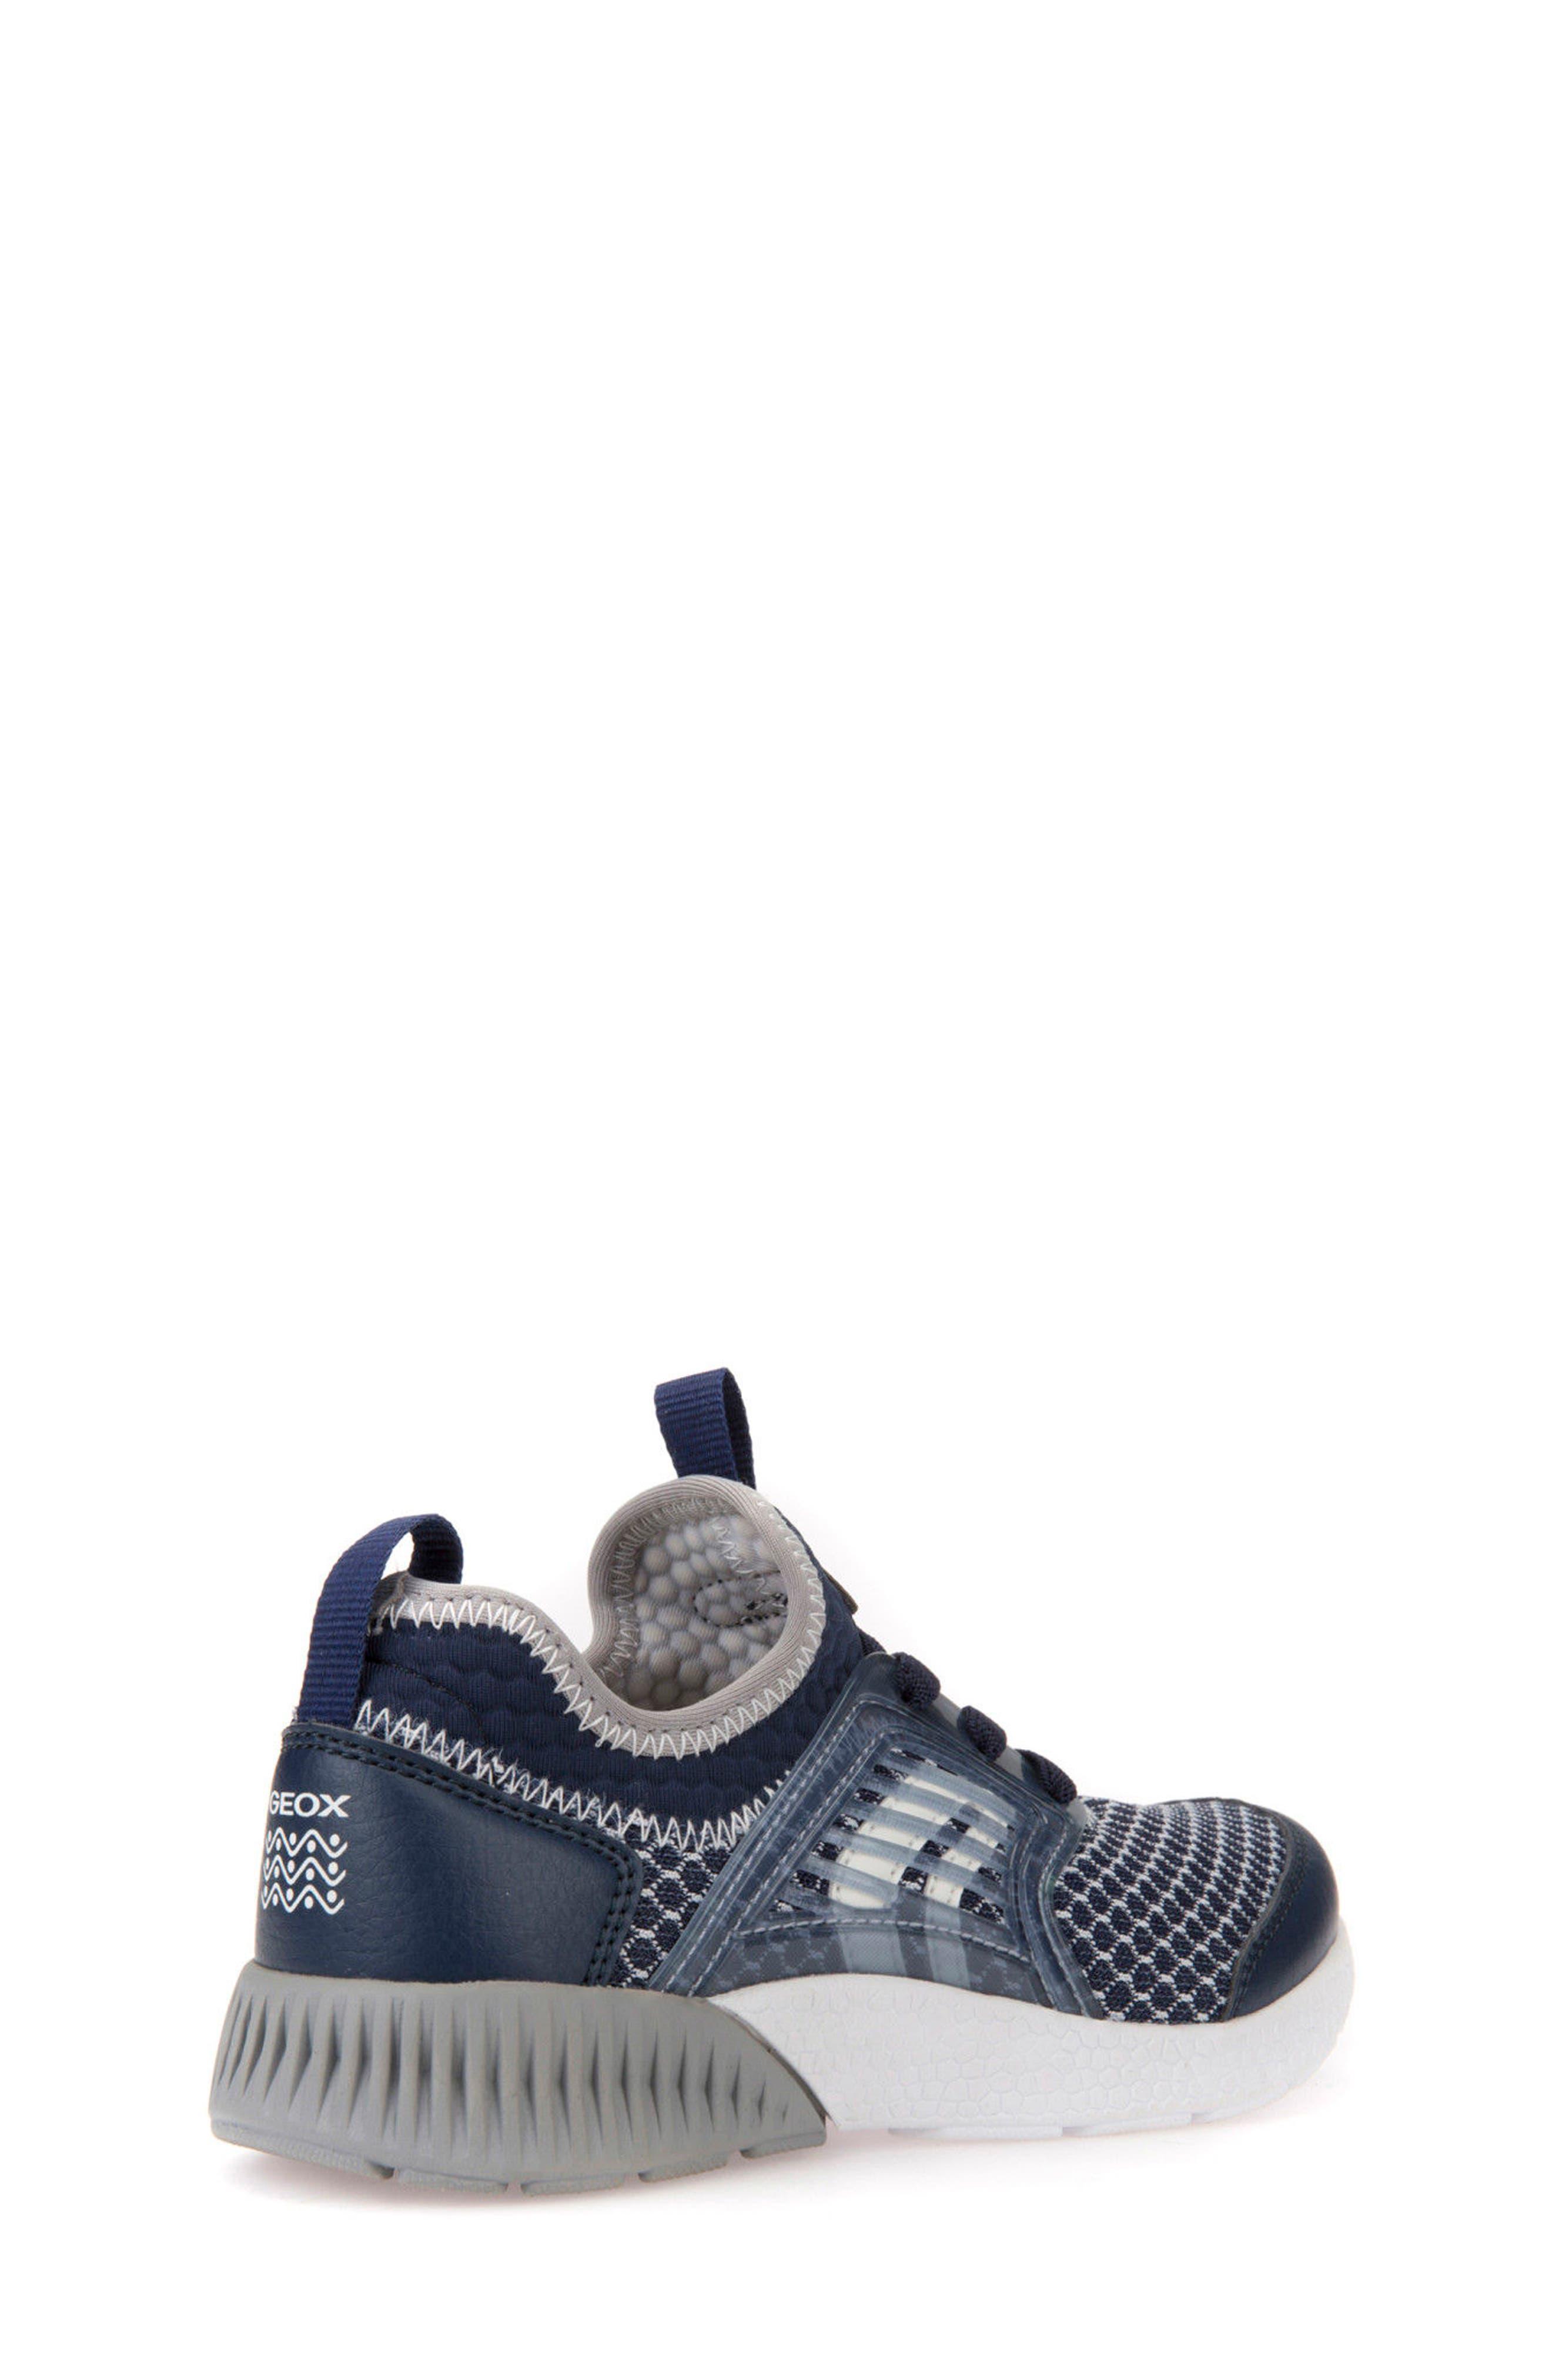 Sveth Sock Sneaker,                             Alternate thumbnail 2, color,                             Navy/ Grey